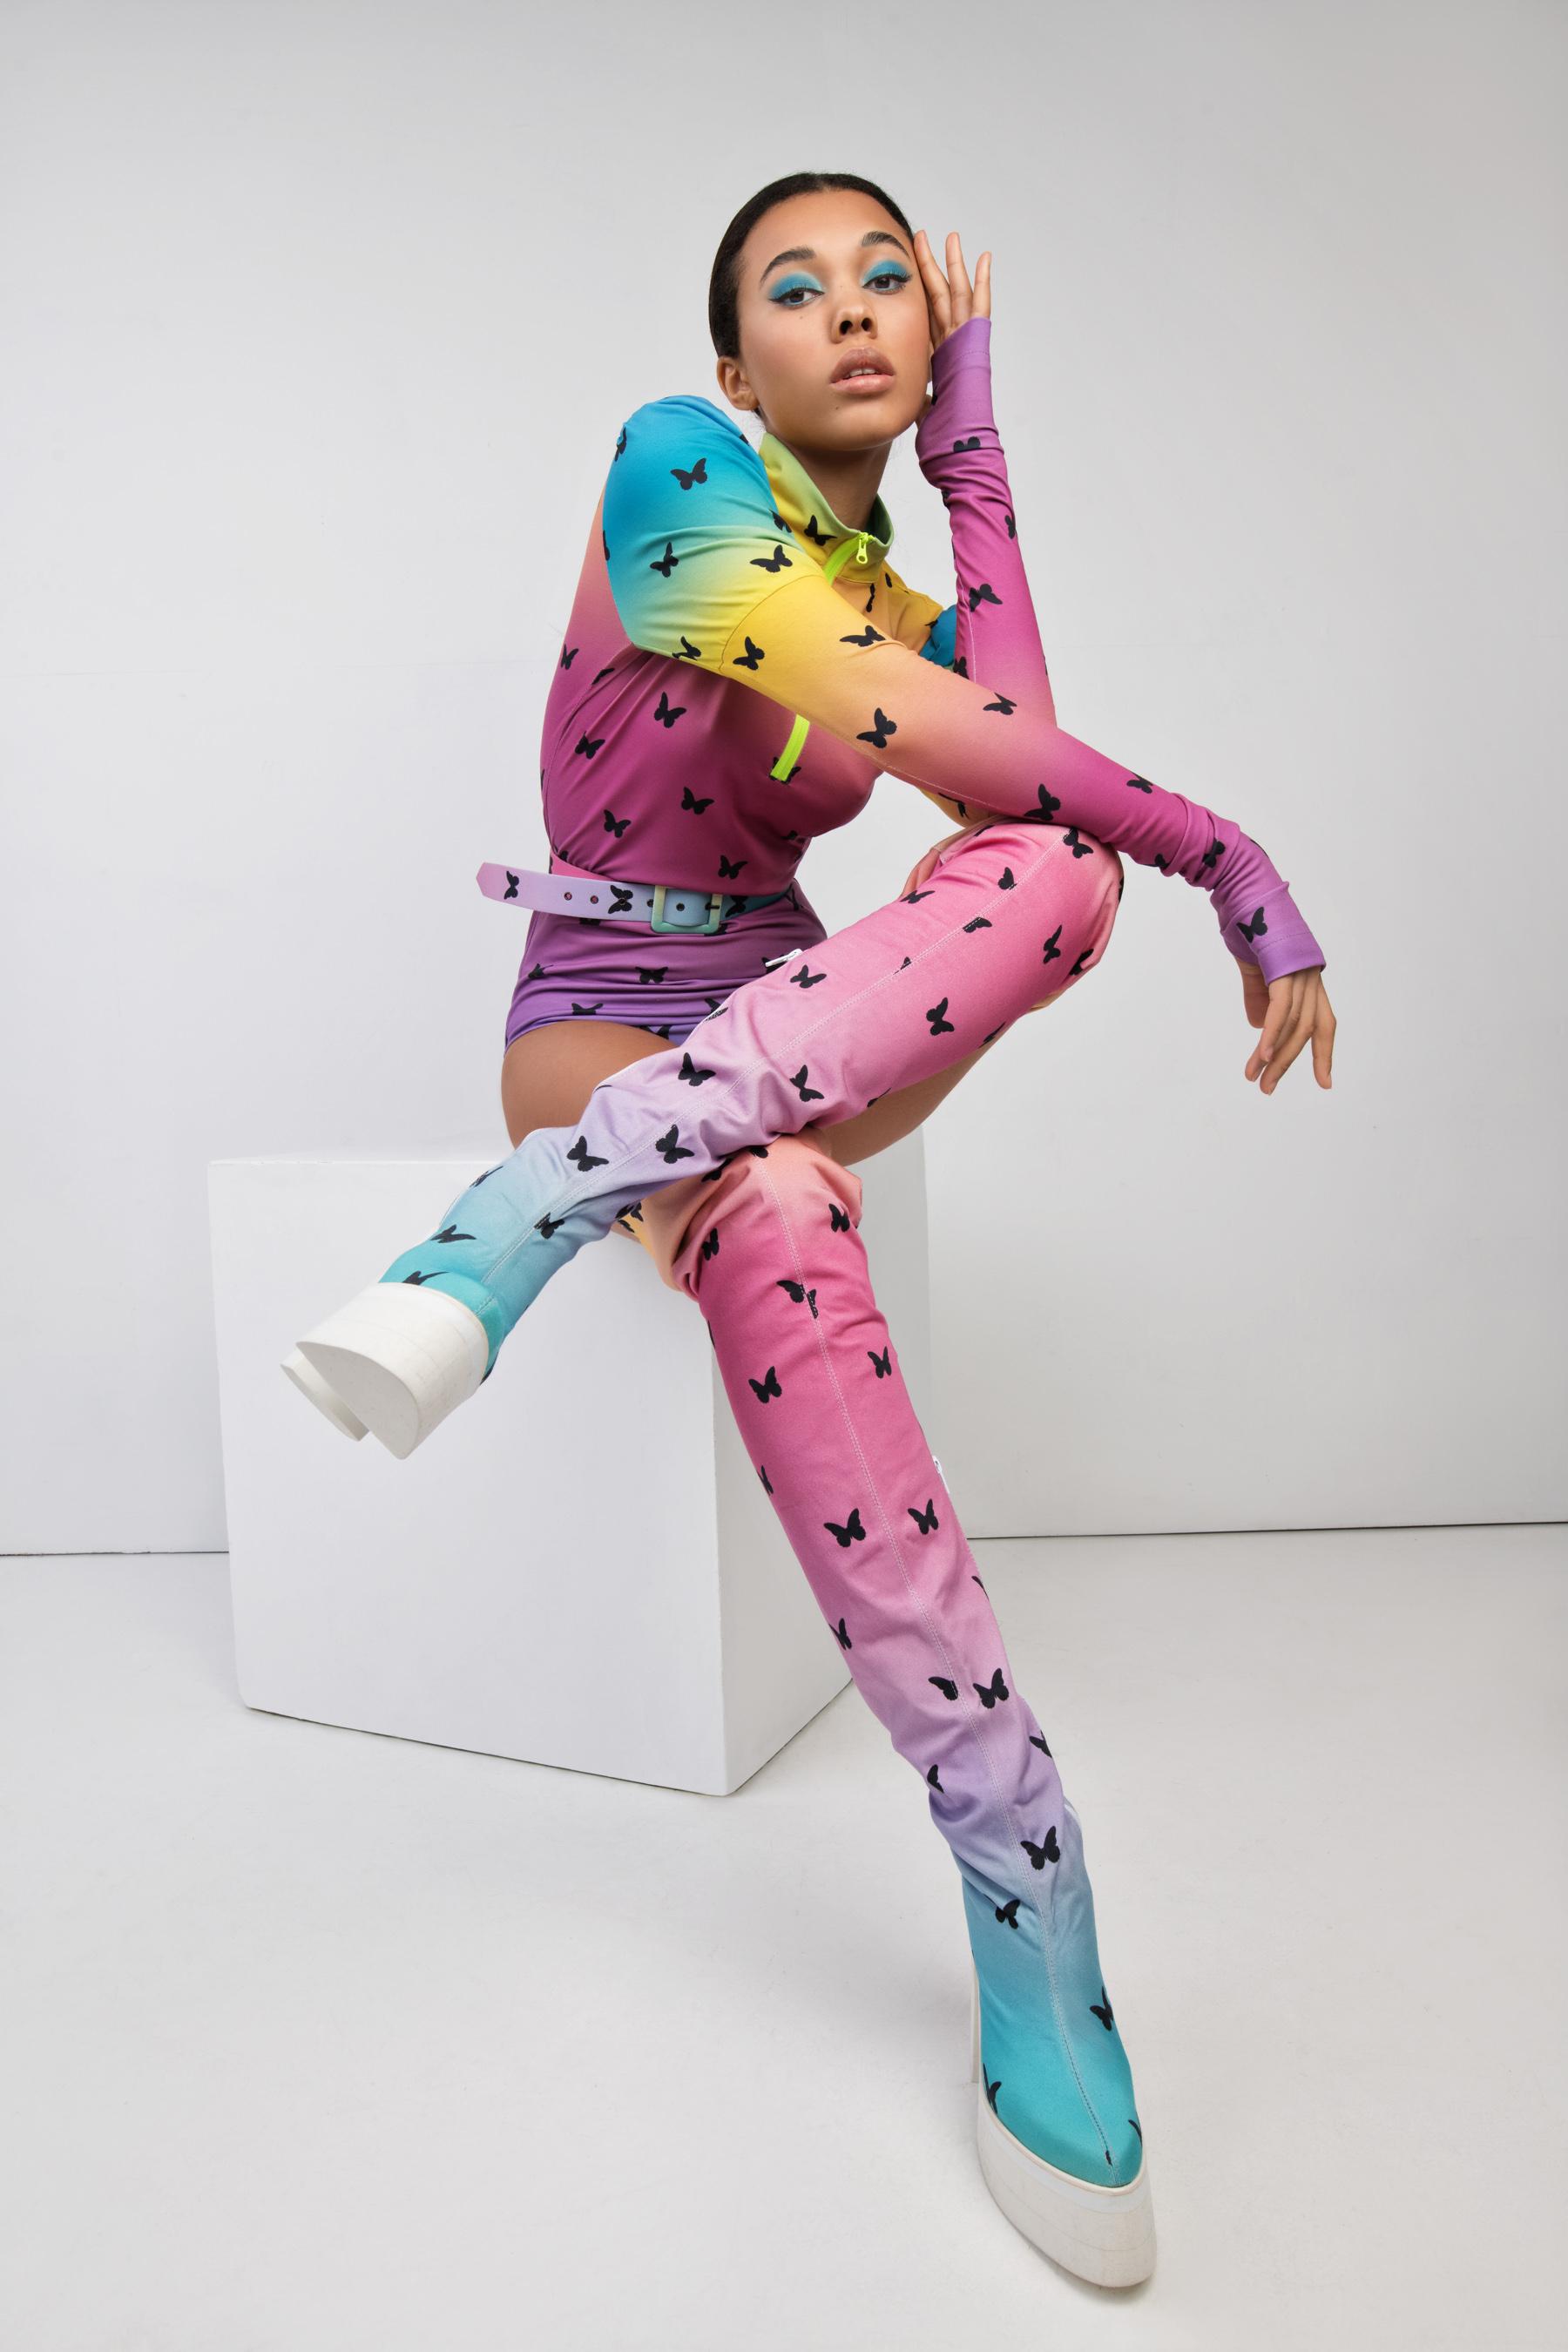 Agen Kuzmickaite Fall 2021 Fashion Show